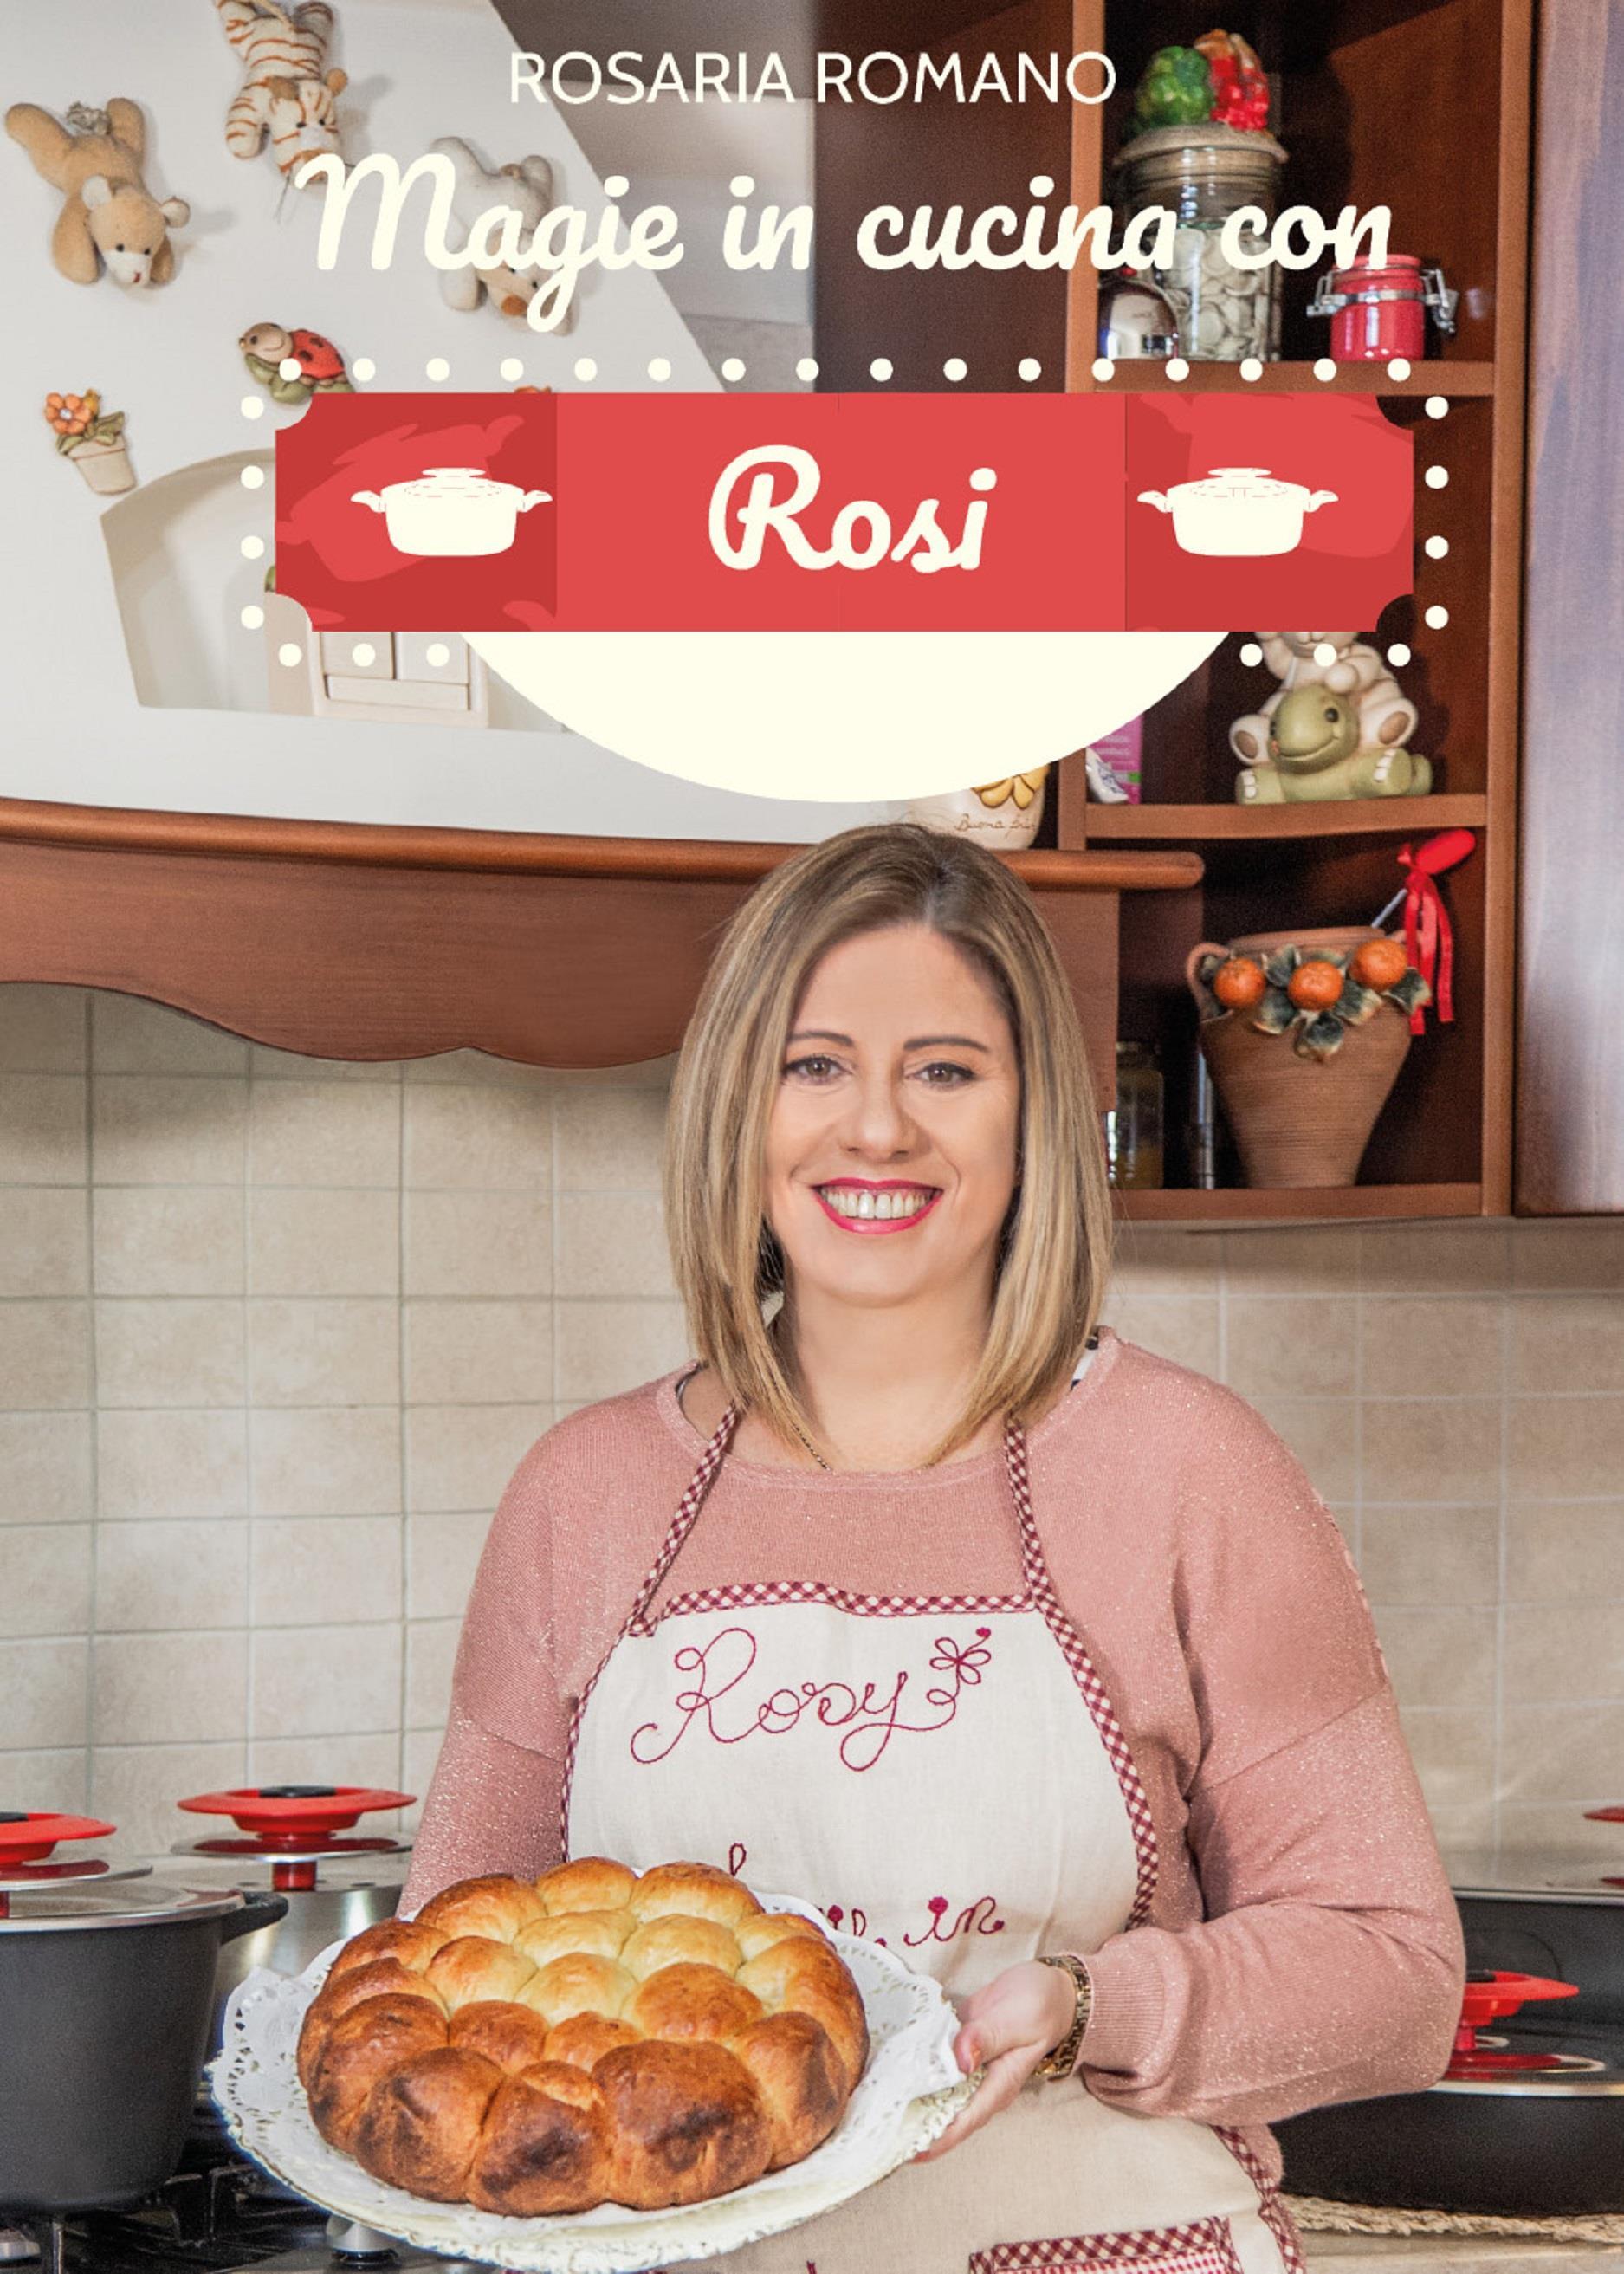 Magie in cucina con Rosi